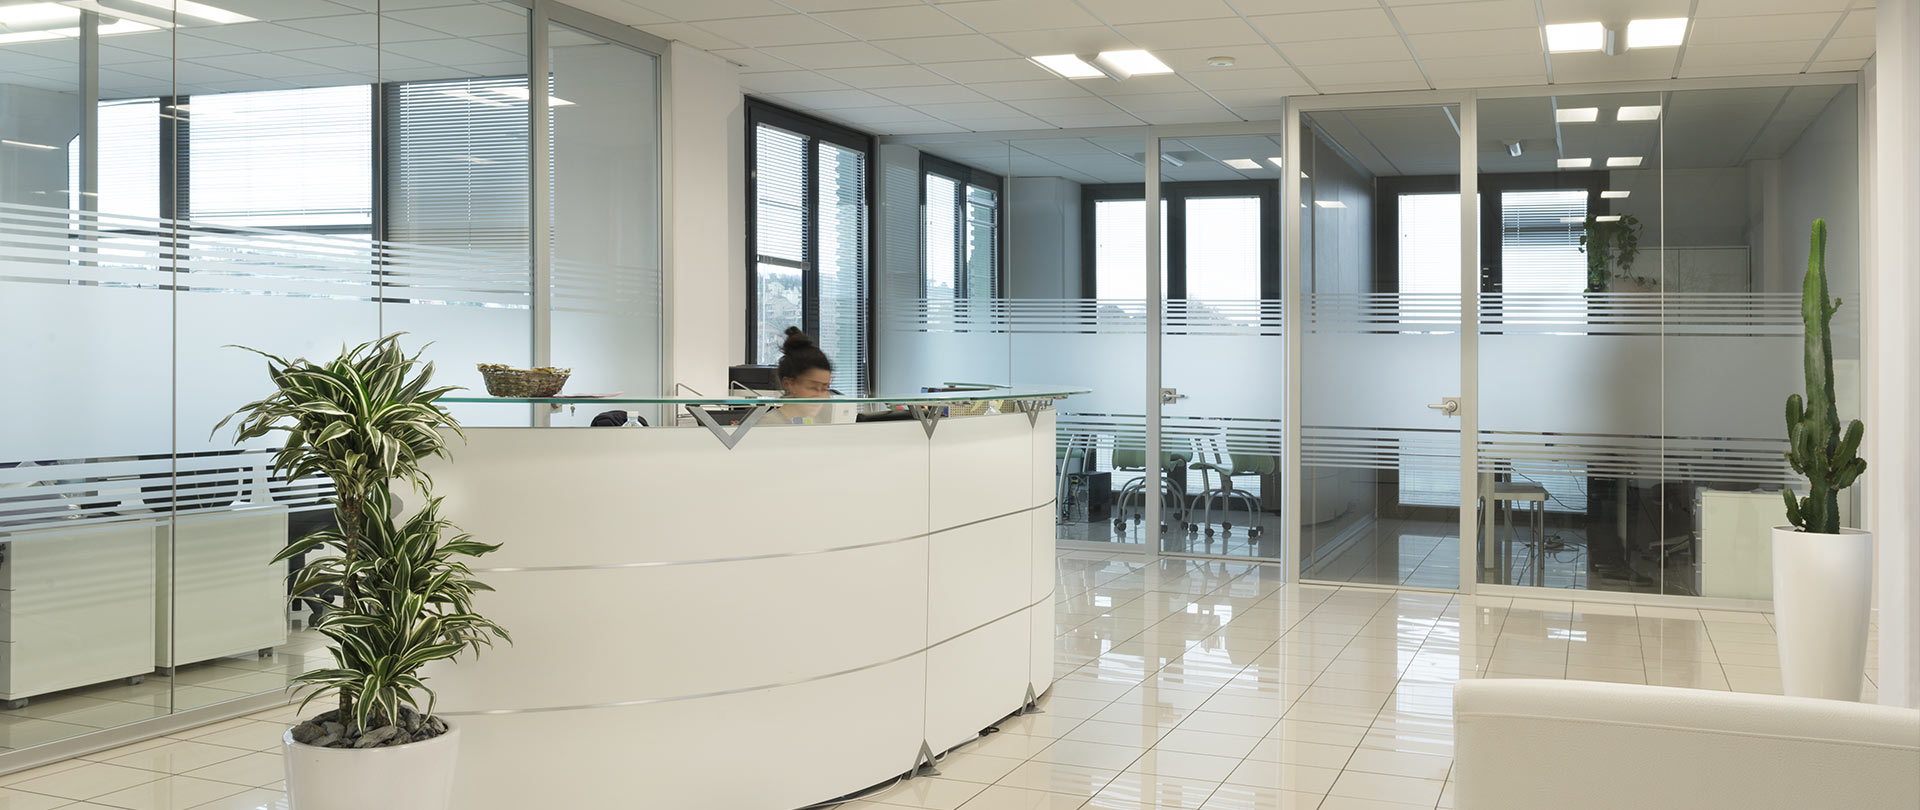 Commercialisti Pesaro